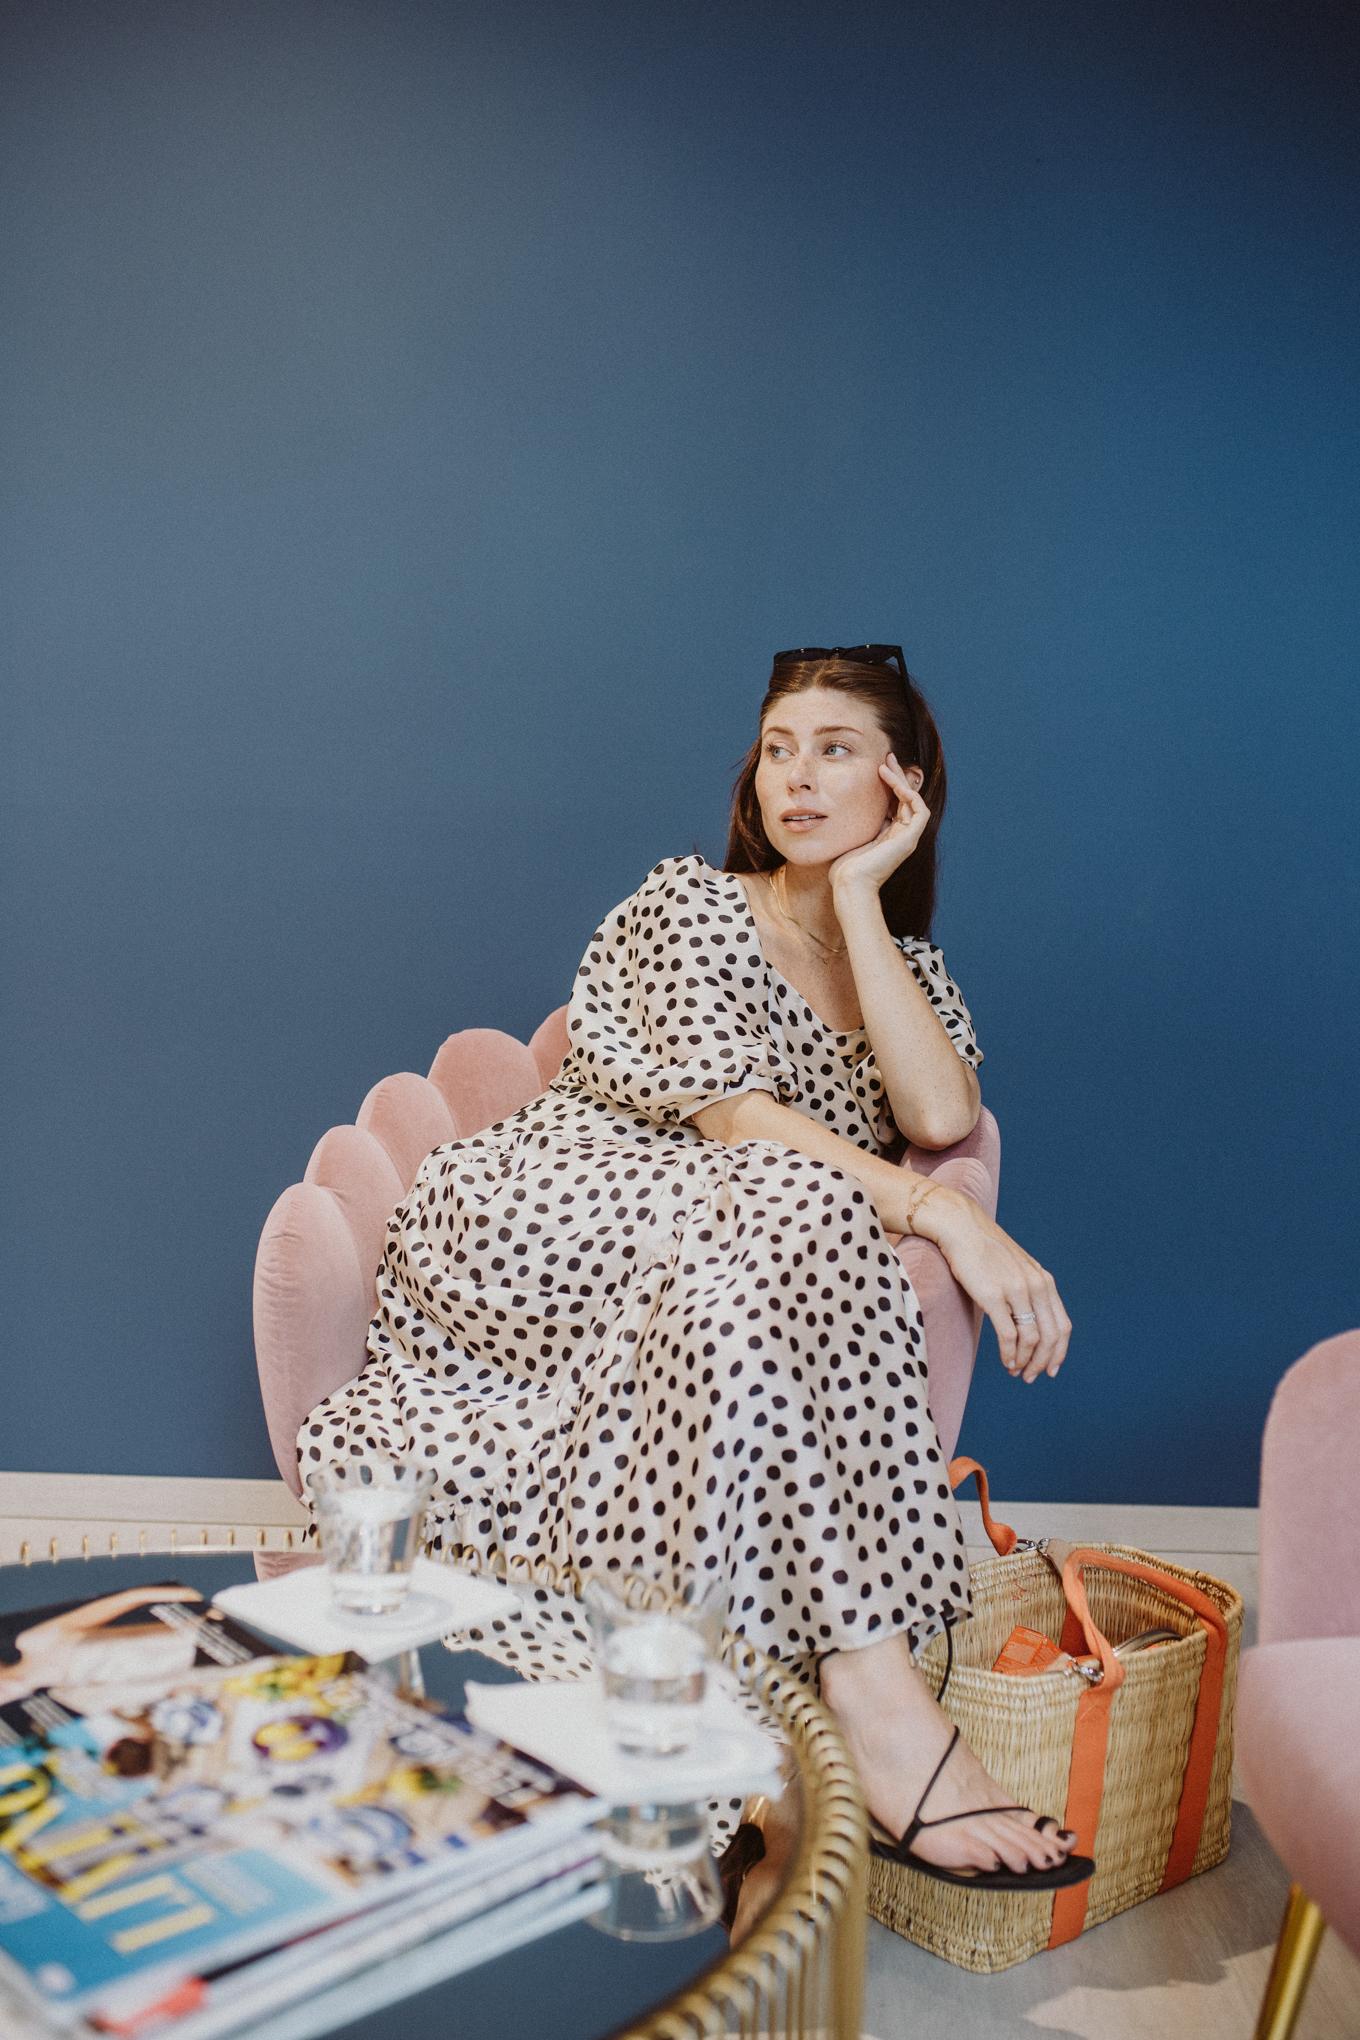 Vienna Picks: Dear Skin Beauty Concept Store + Gesichtsbehandlung in Wien - Love Daily Dose